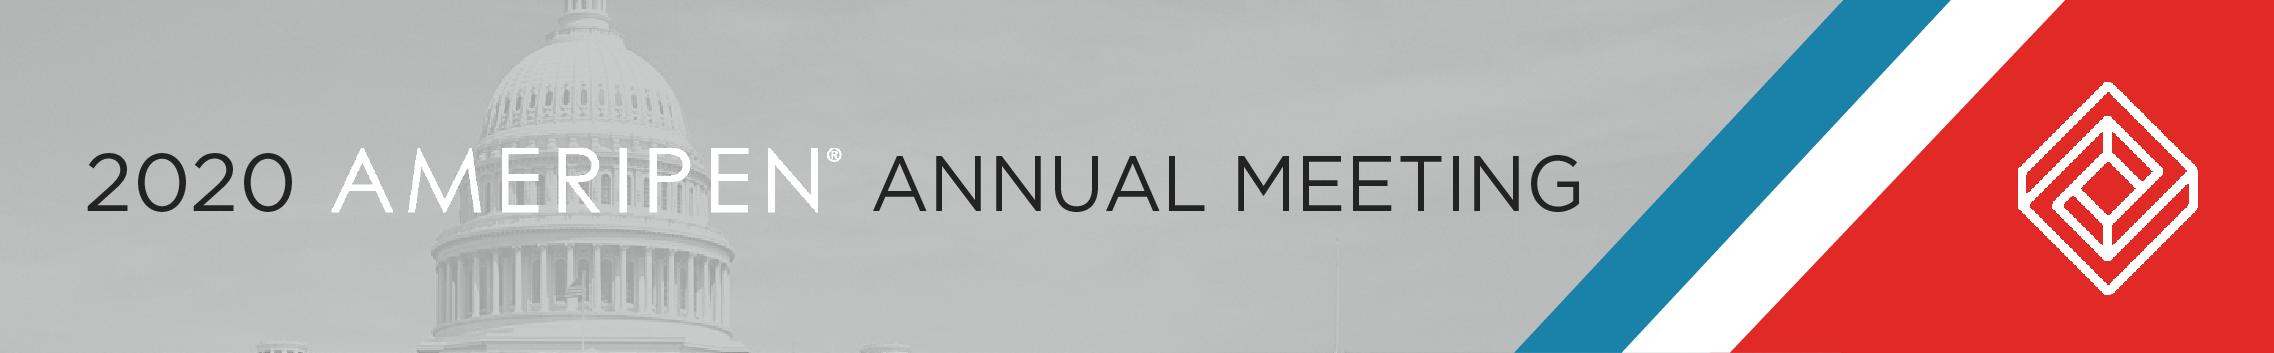 2020 AMERIPEN Annual Meeting